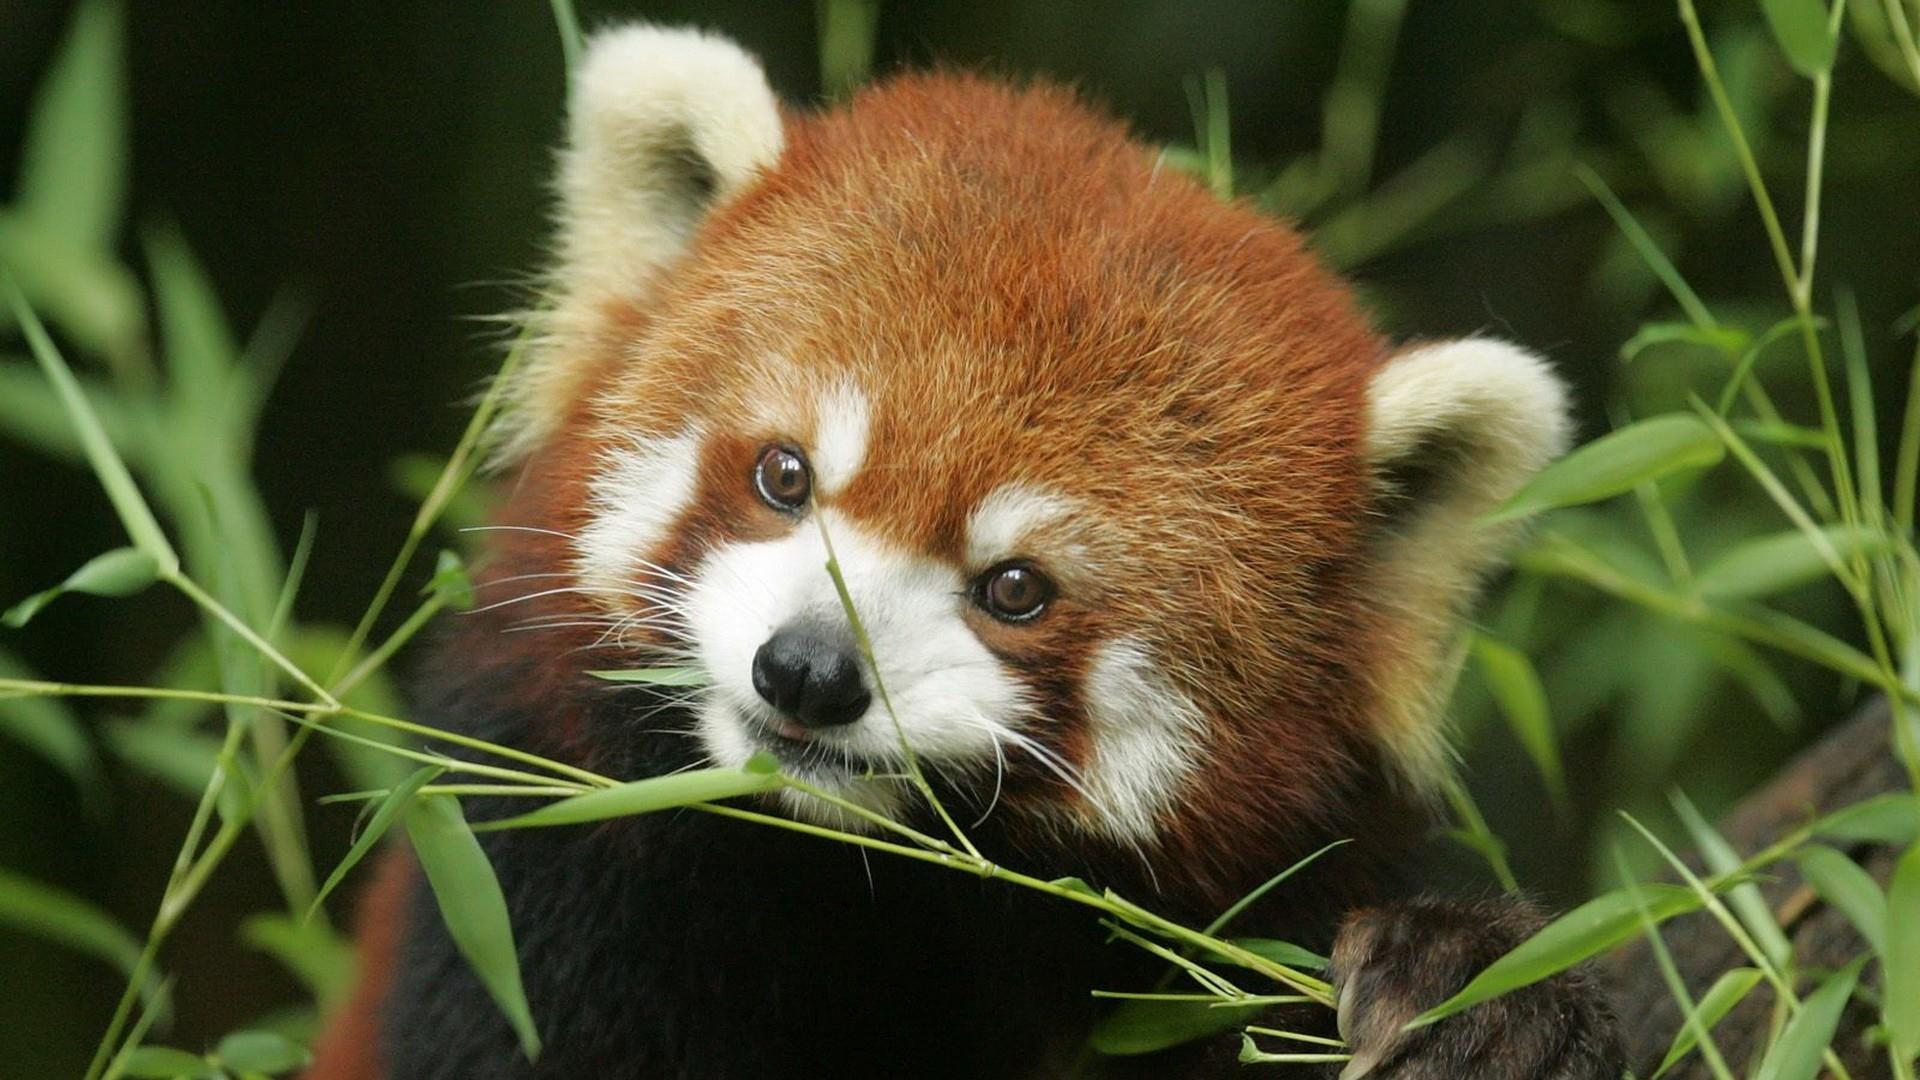 Red Panda Computer Wallpapers, Desktop Backgrounds   1920x1080   ID:360920